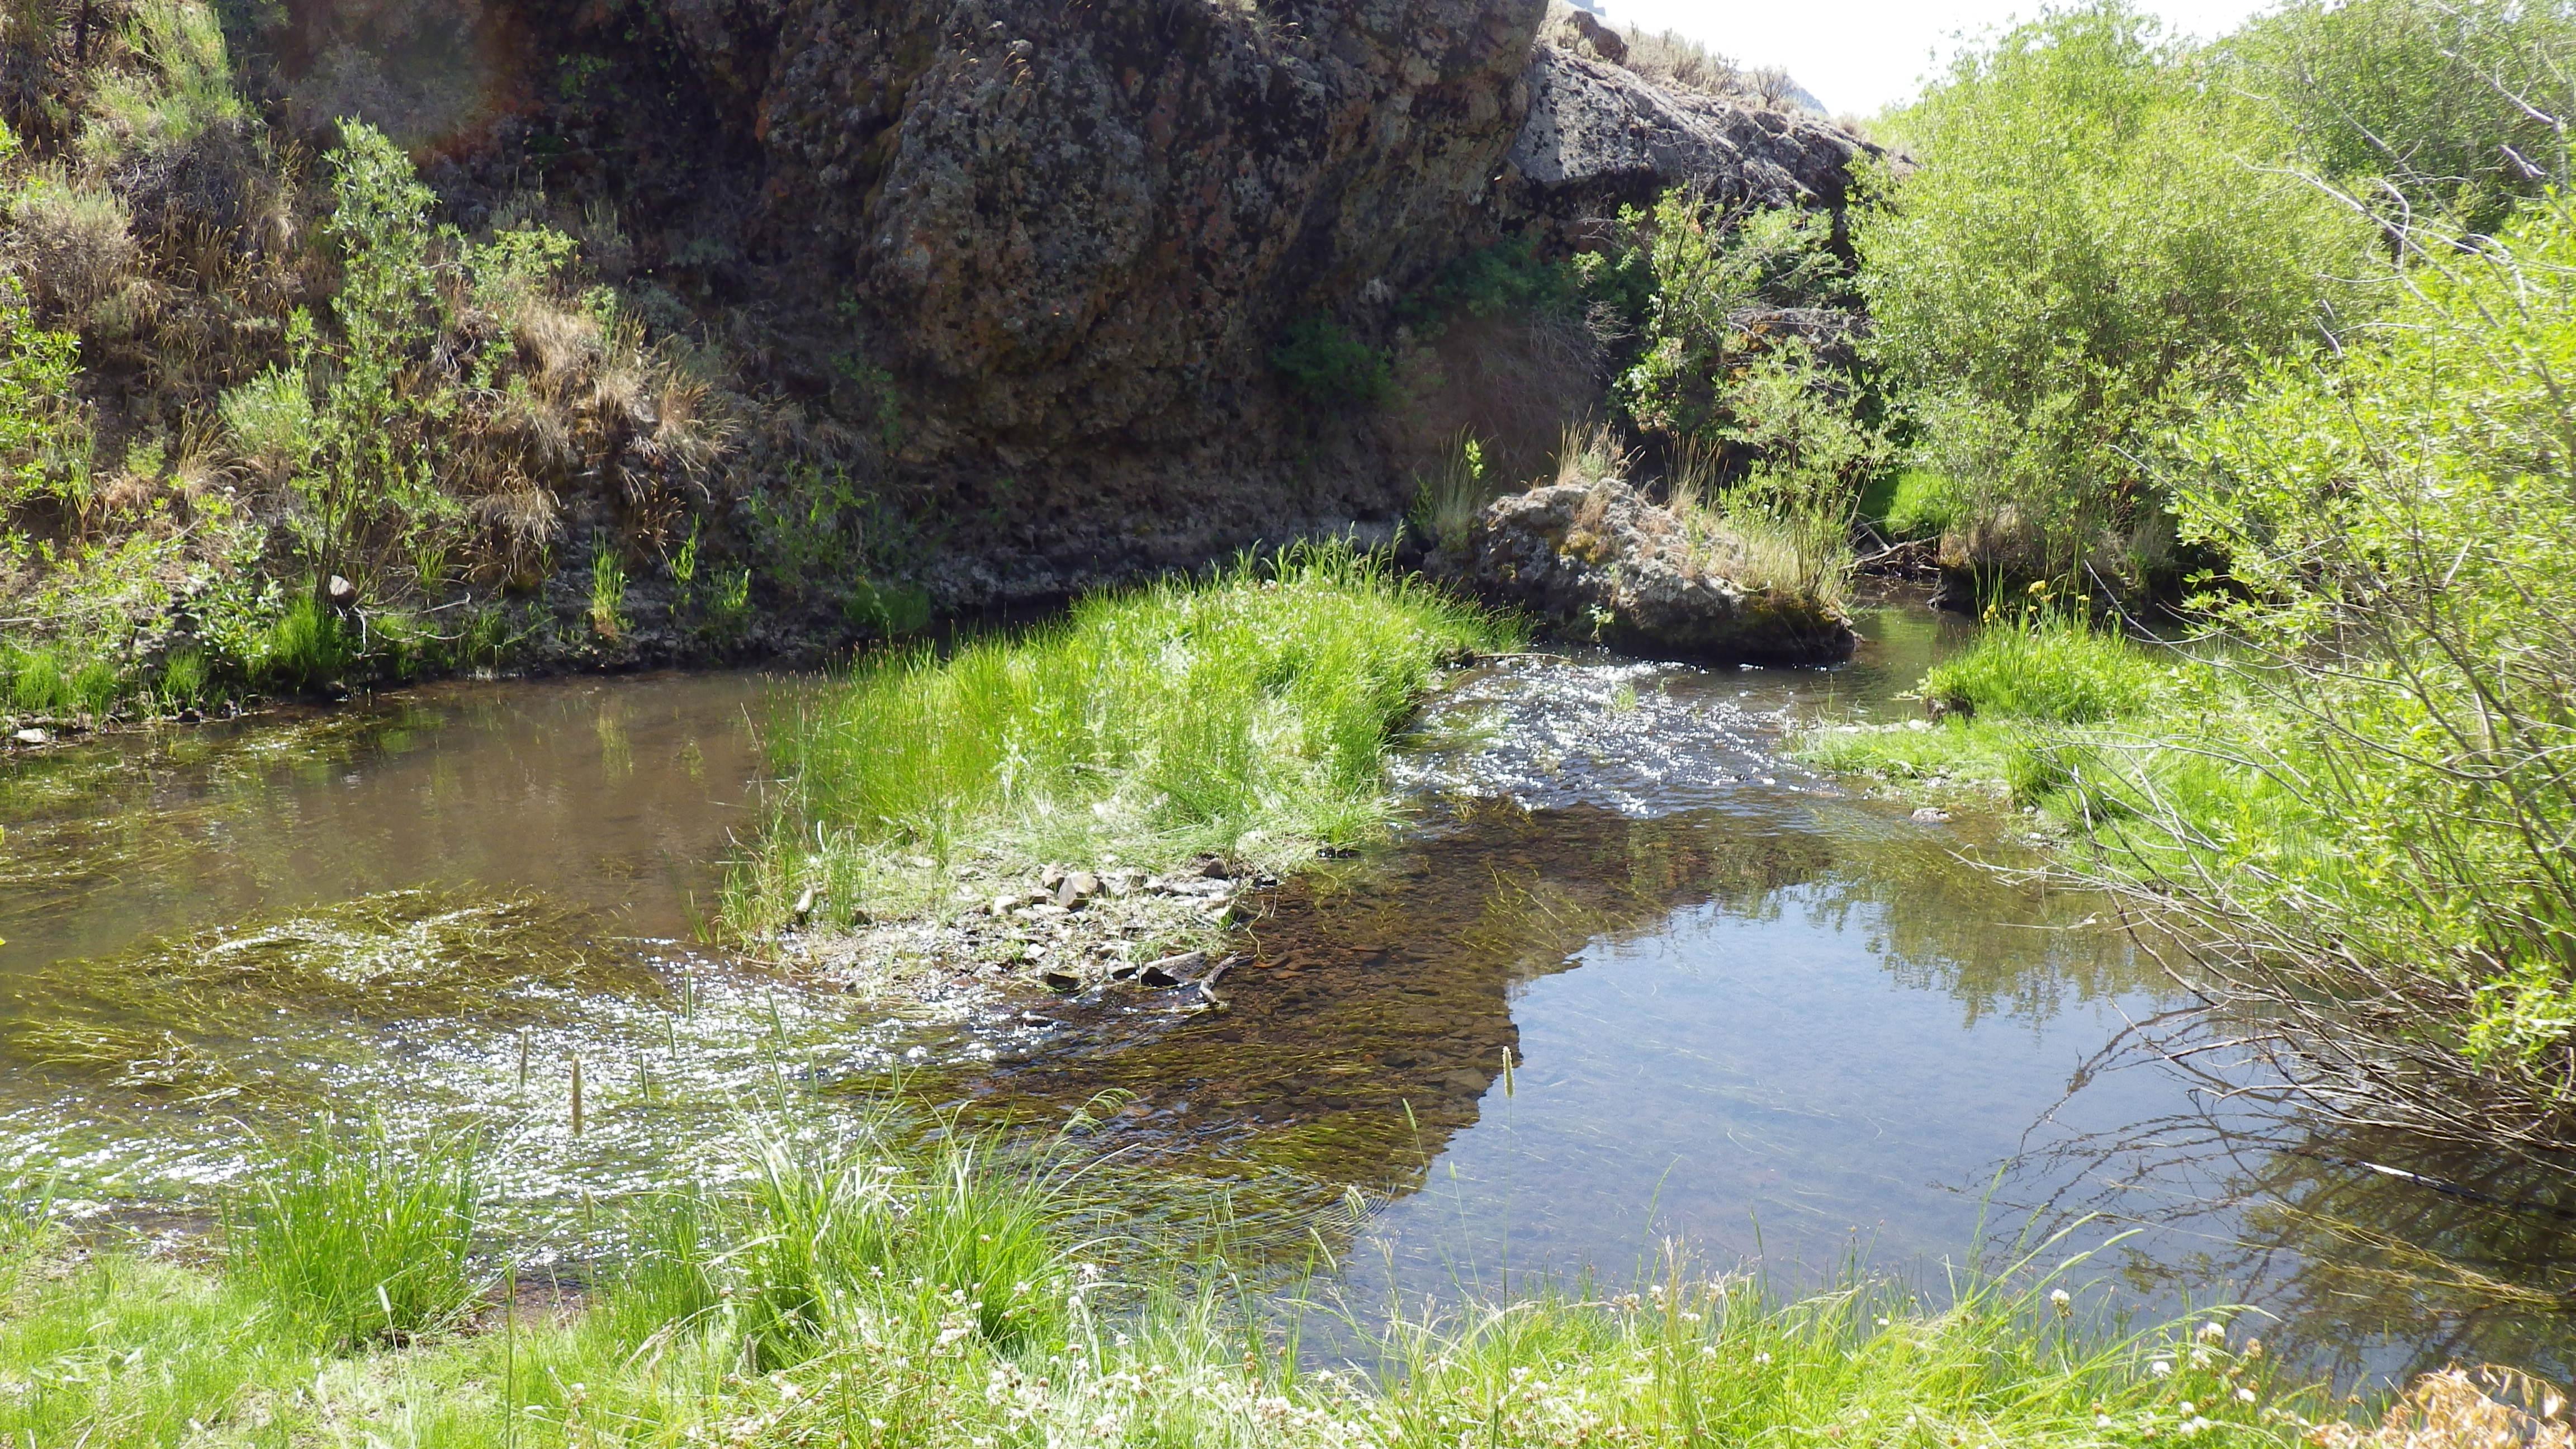 Goose Creek, Sawtooth National Forest, Idaho